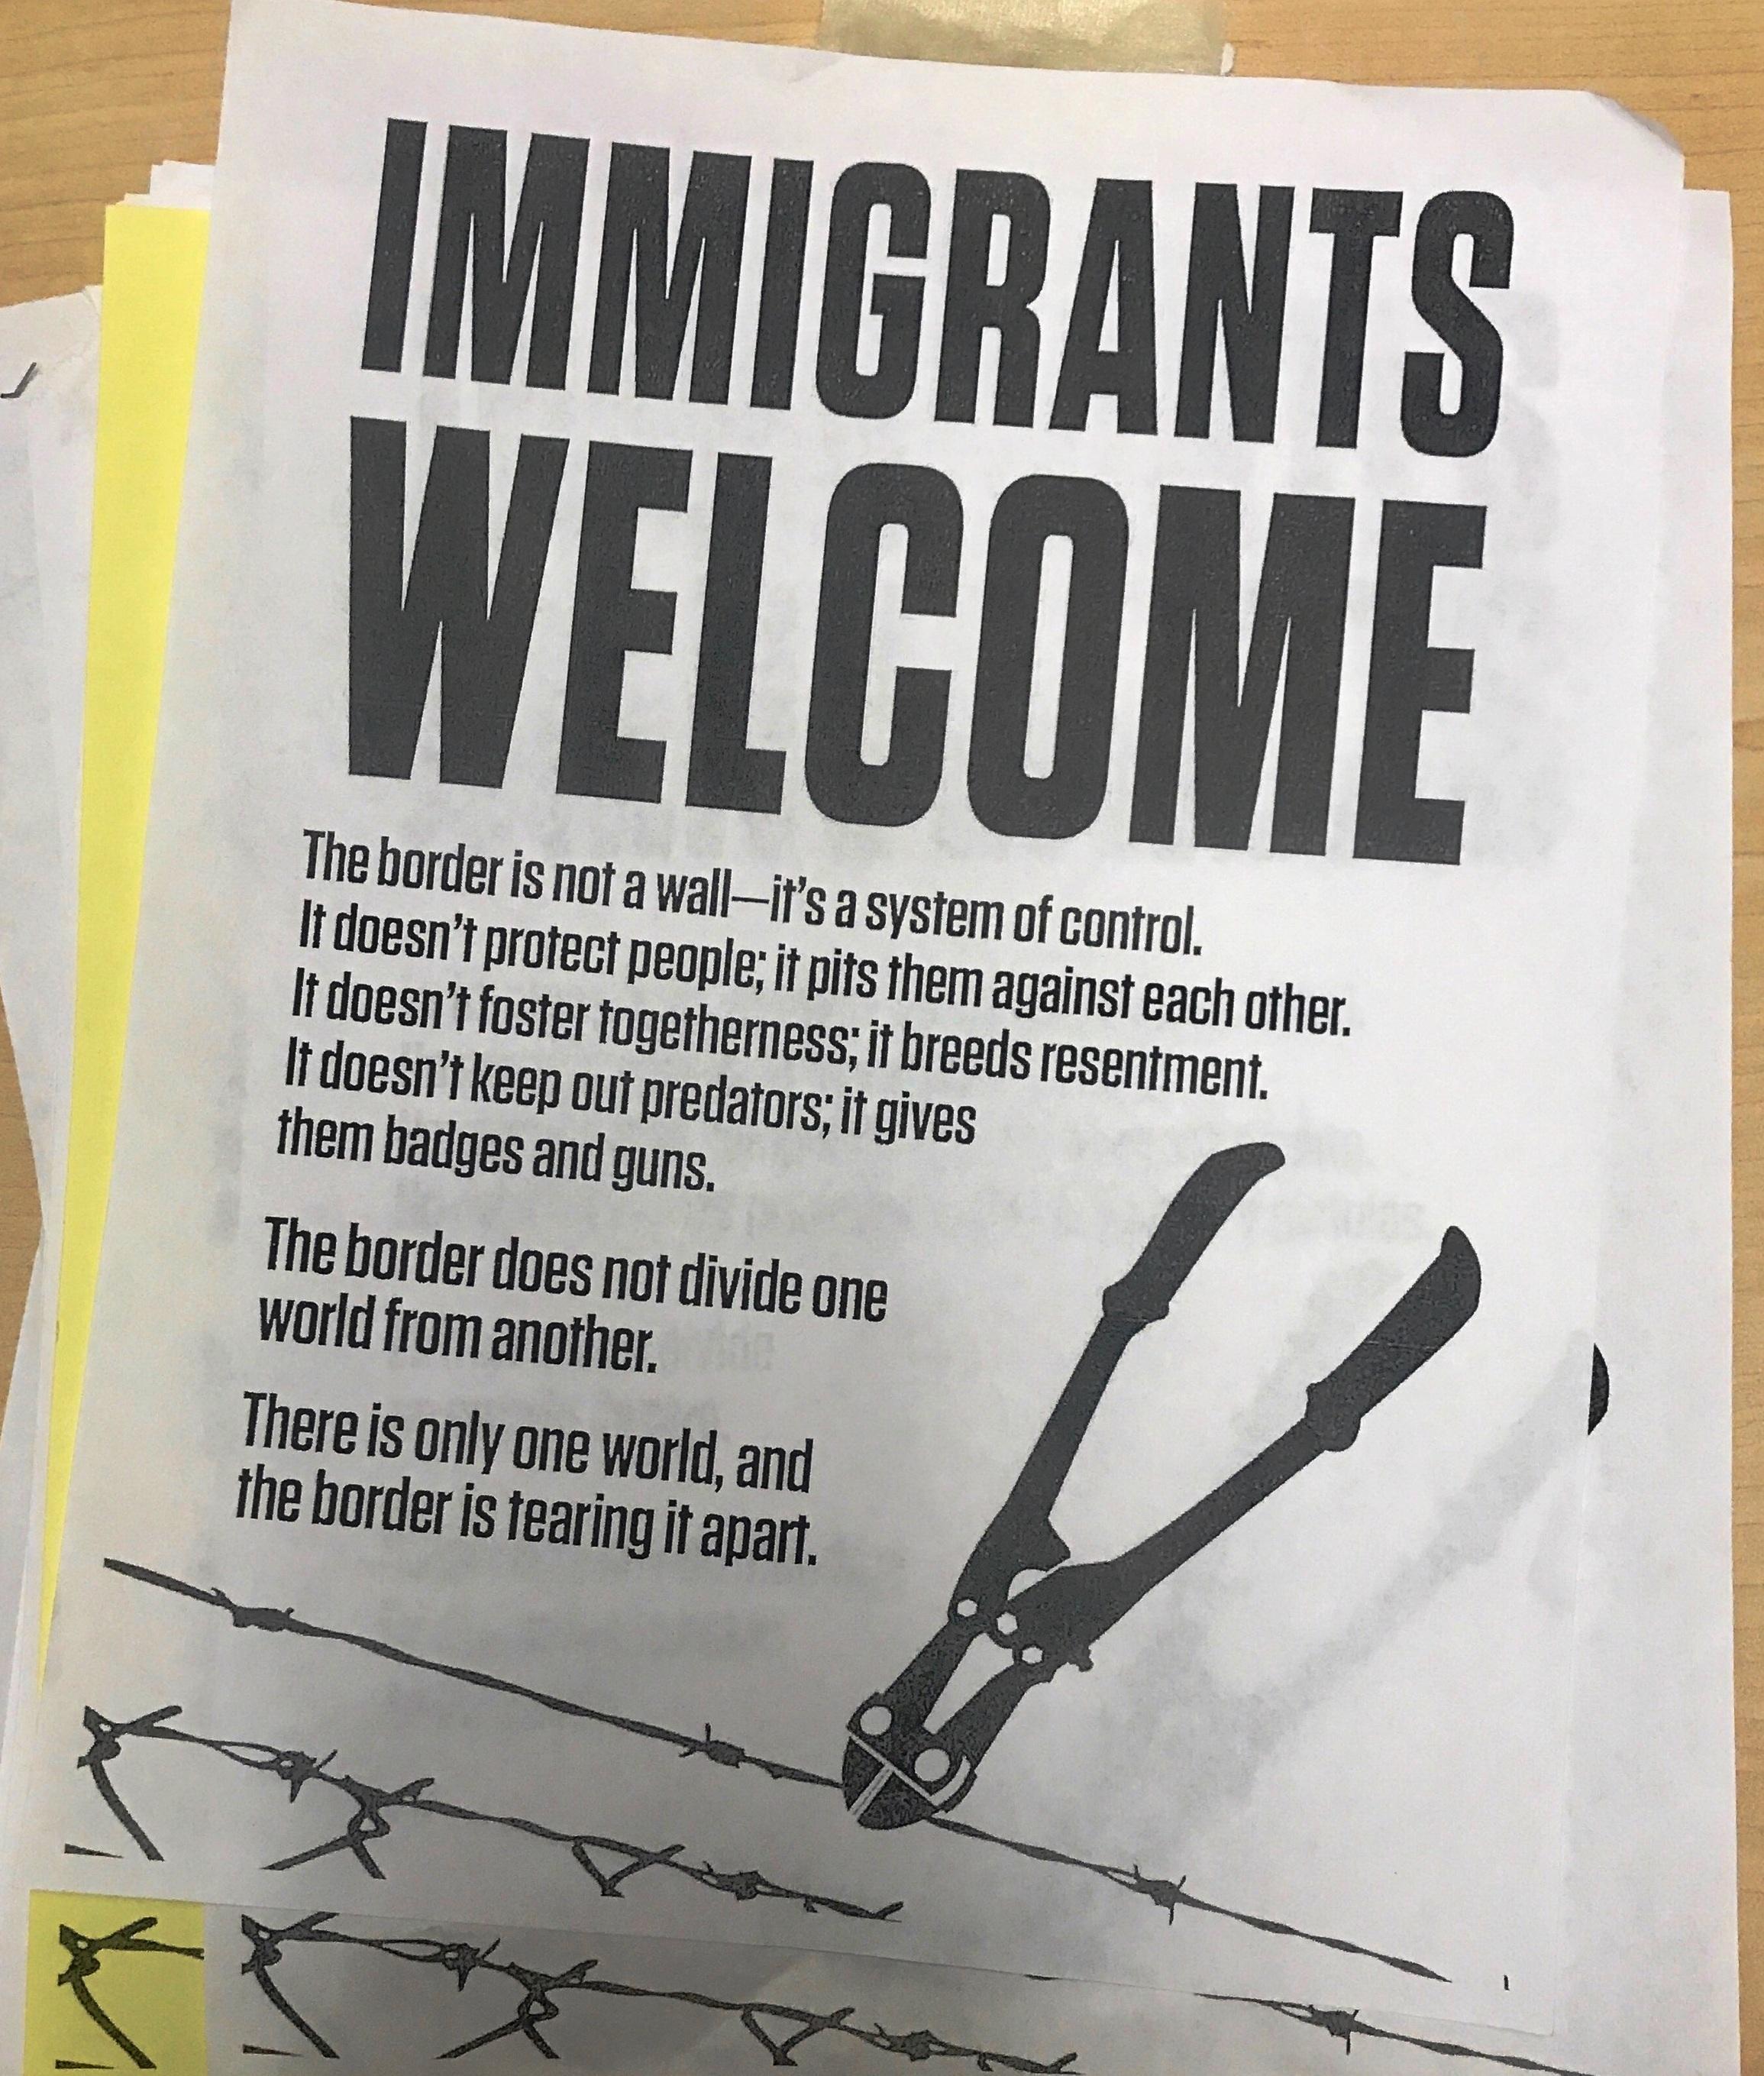 Posters in OR Elementary School Seem to Call Police Predators